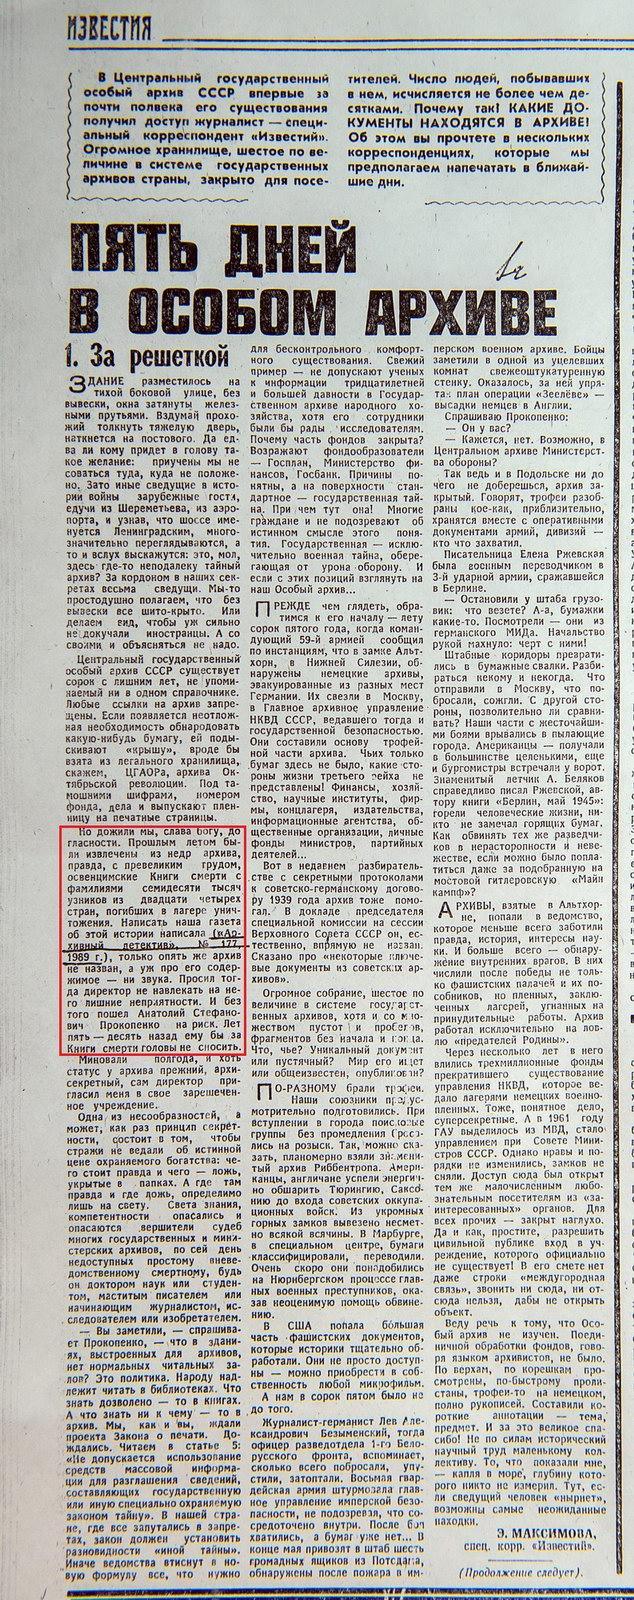 (Газета «Известия», №49 (22952), от 18 февраля 1990 г., с. 6).